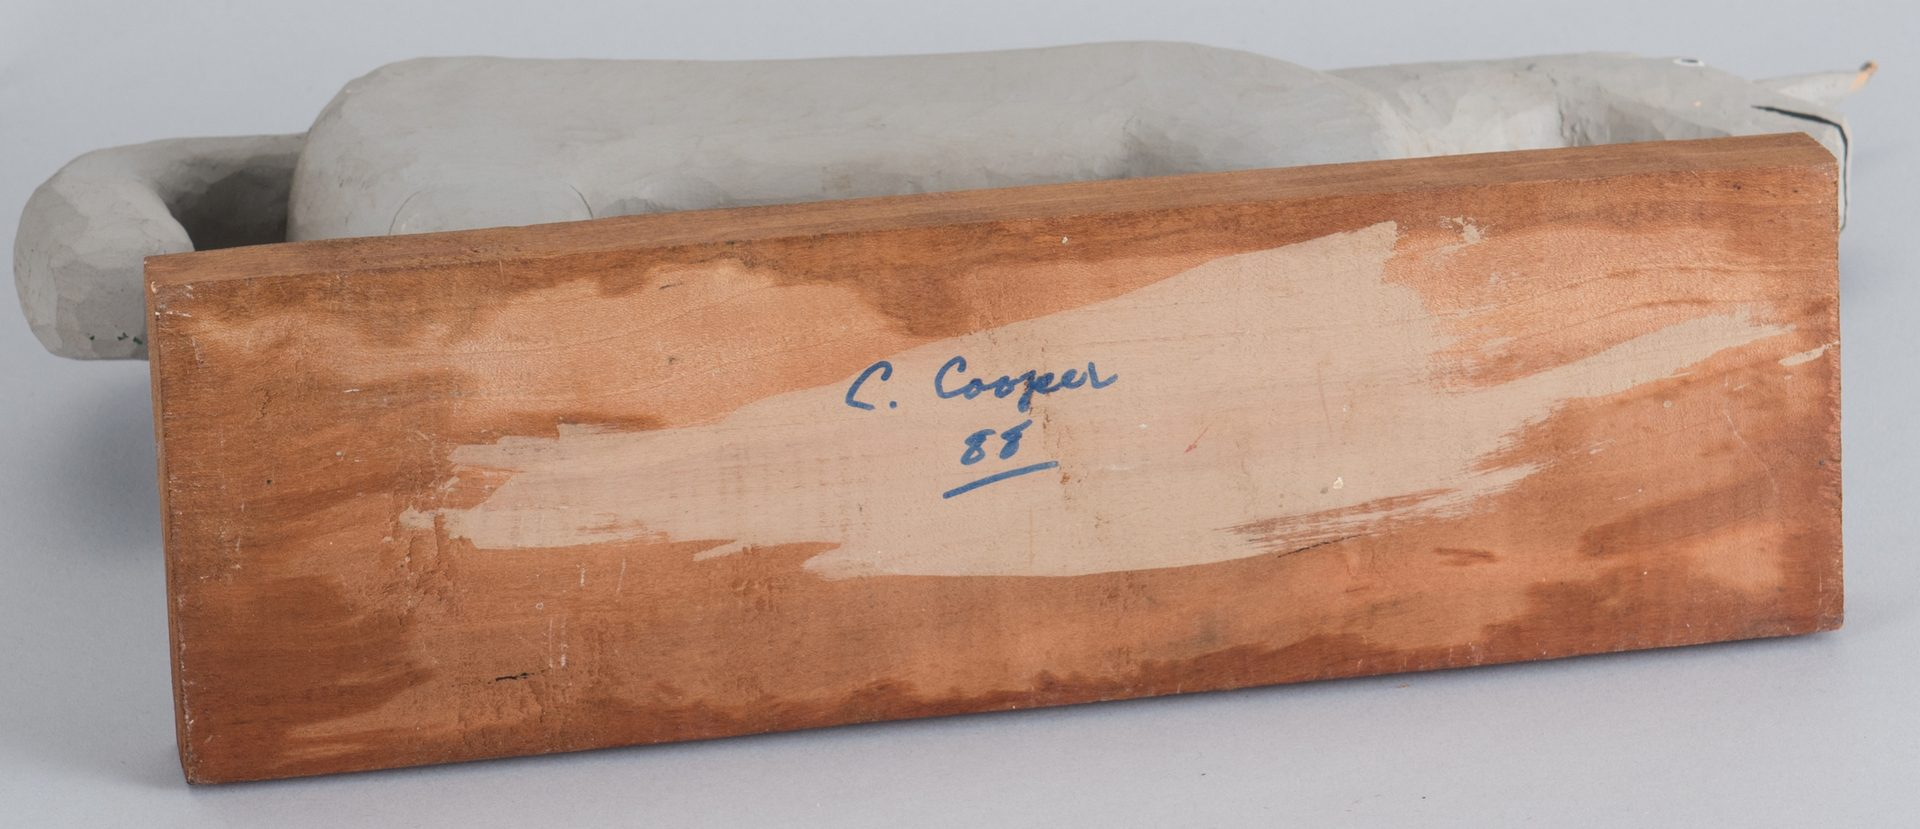 Lot 664: 3 Calvin Cooper Folk Art Carvings